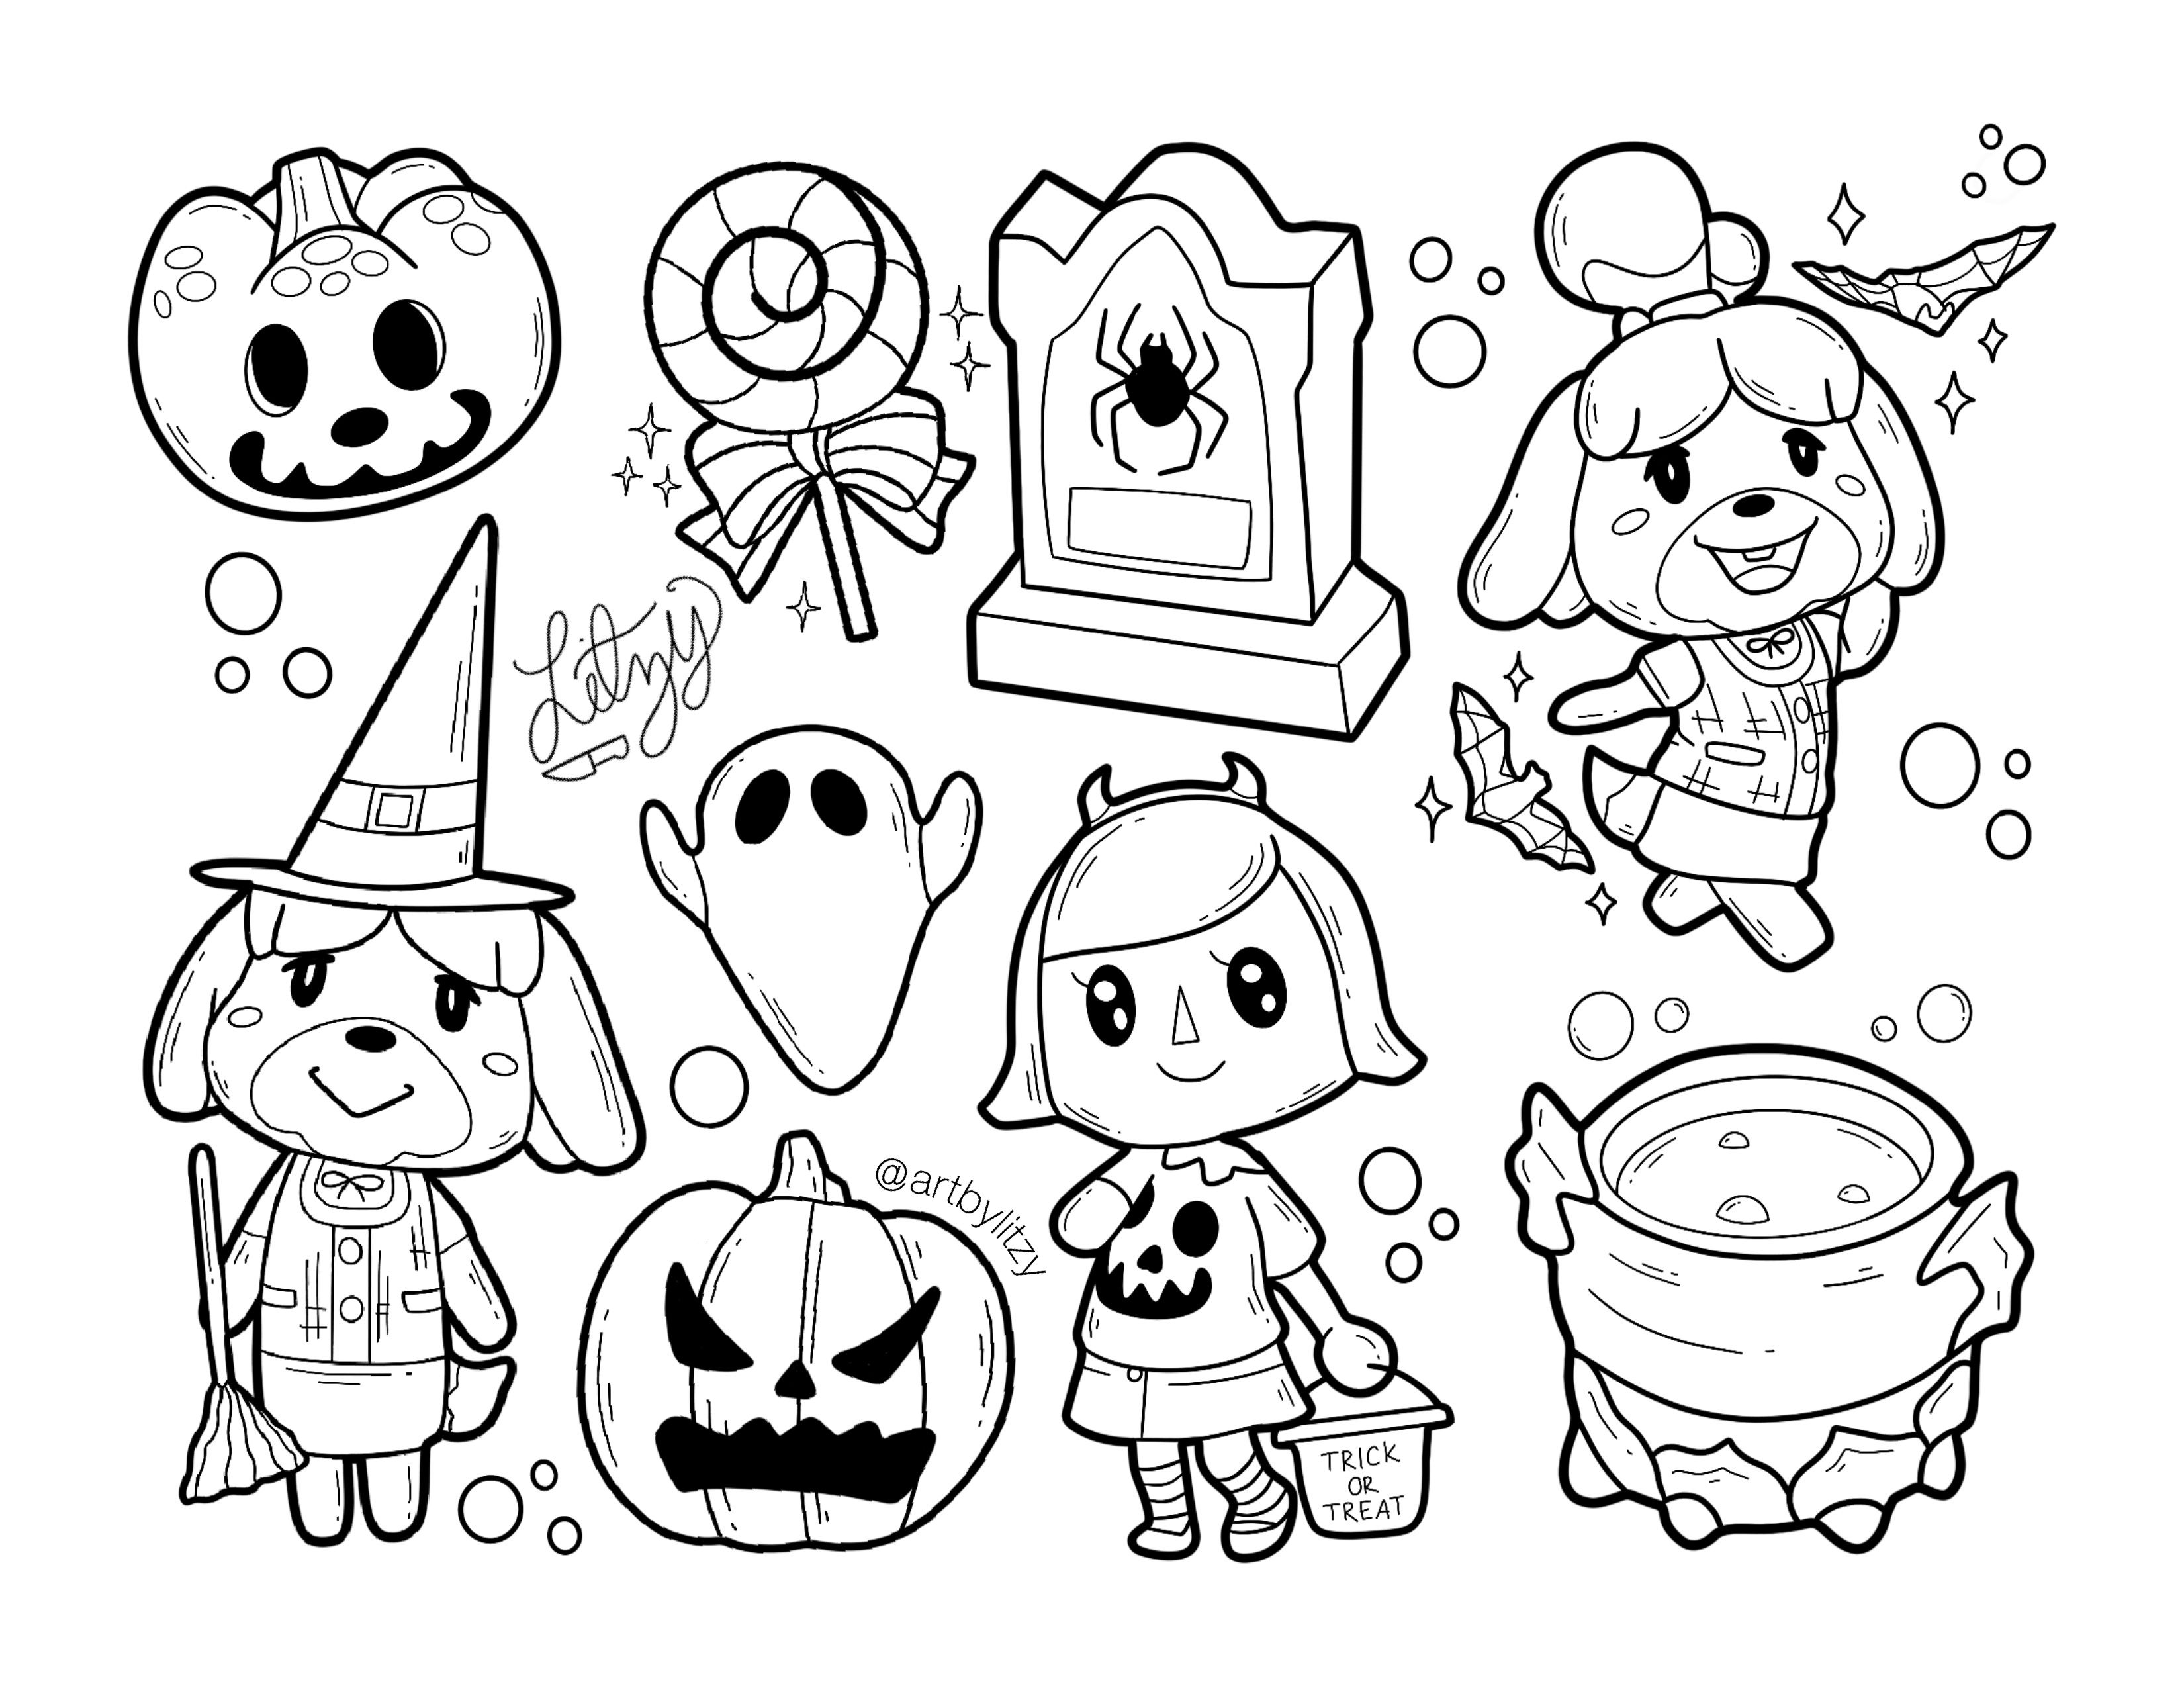 Animal Crossing Flash Ig Artbylitzy Halloween Tattoo Flash Animal Crossing Fan Art Halloween Tattoos